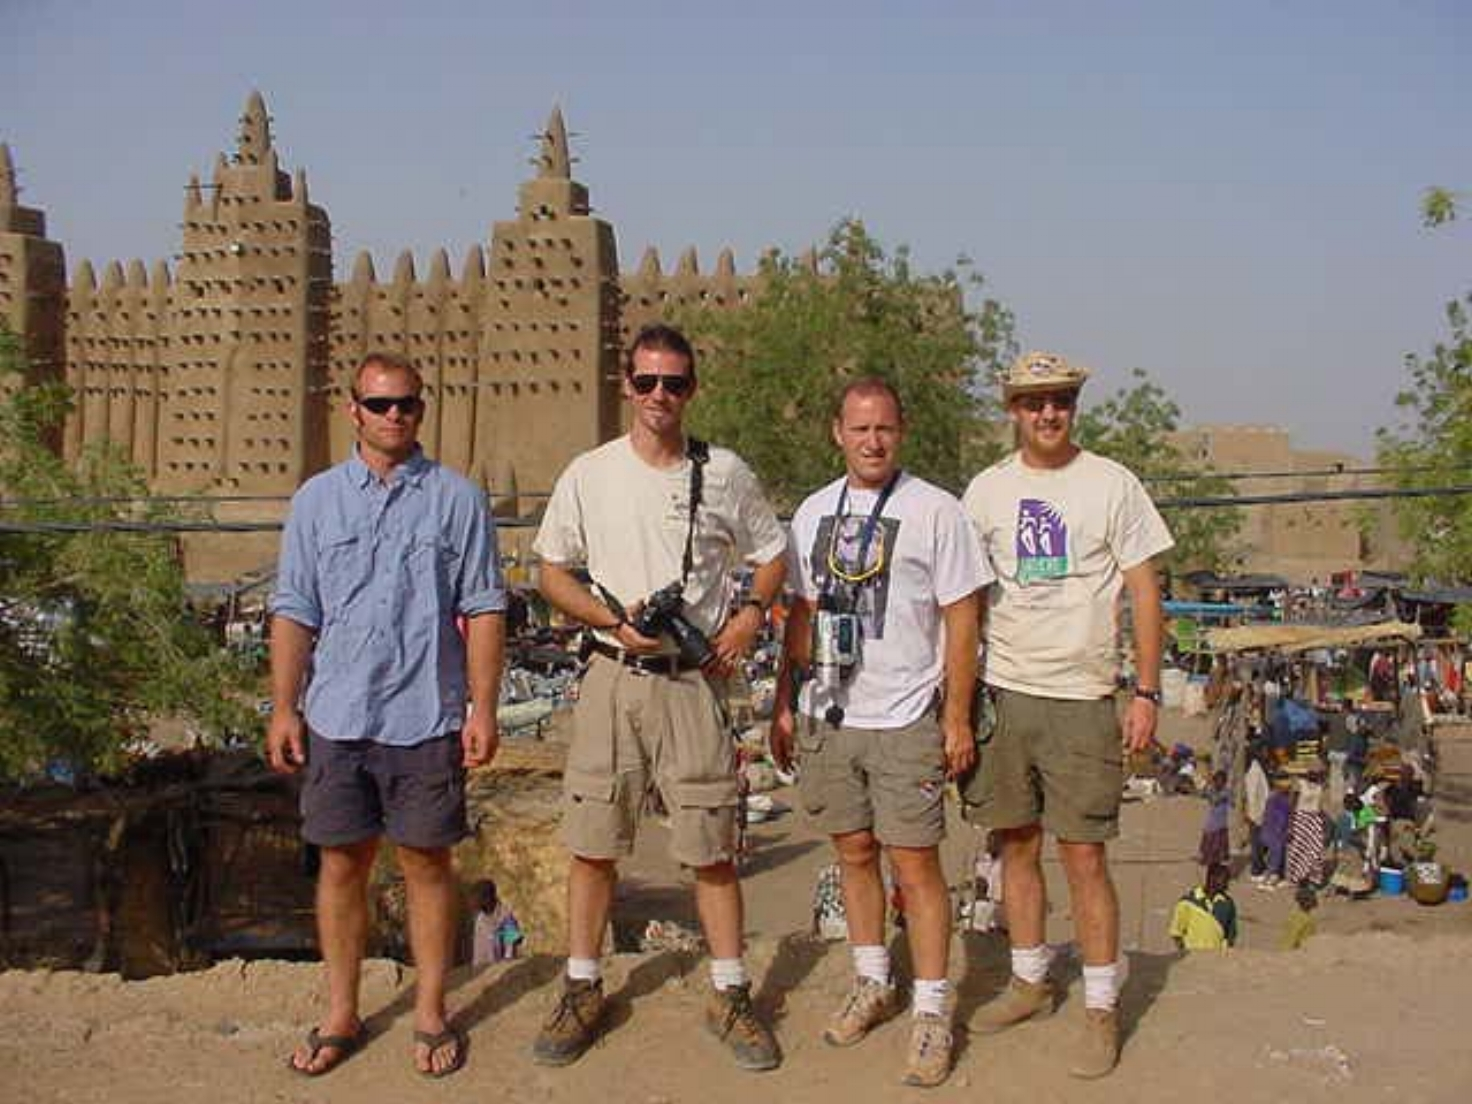 Shane Ballensky, Jim Leach, Michael Ladden & Wilson Bullard with the Grand Mosque beyond